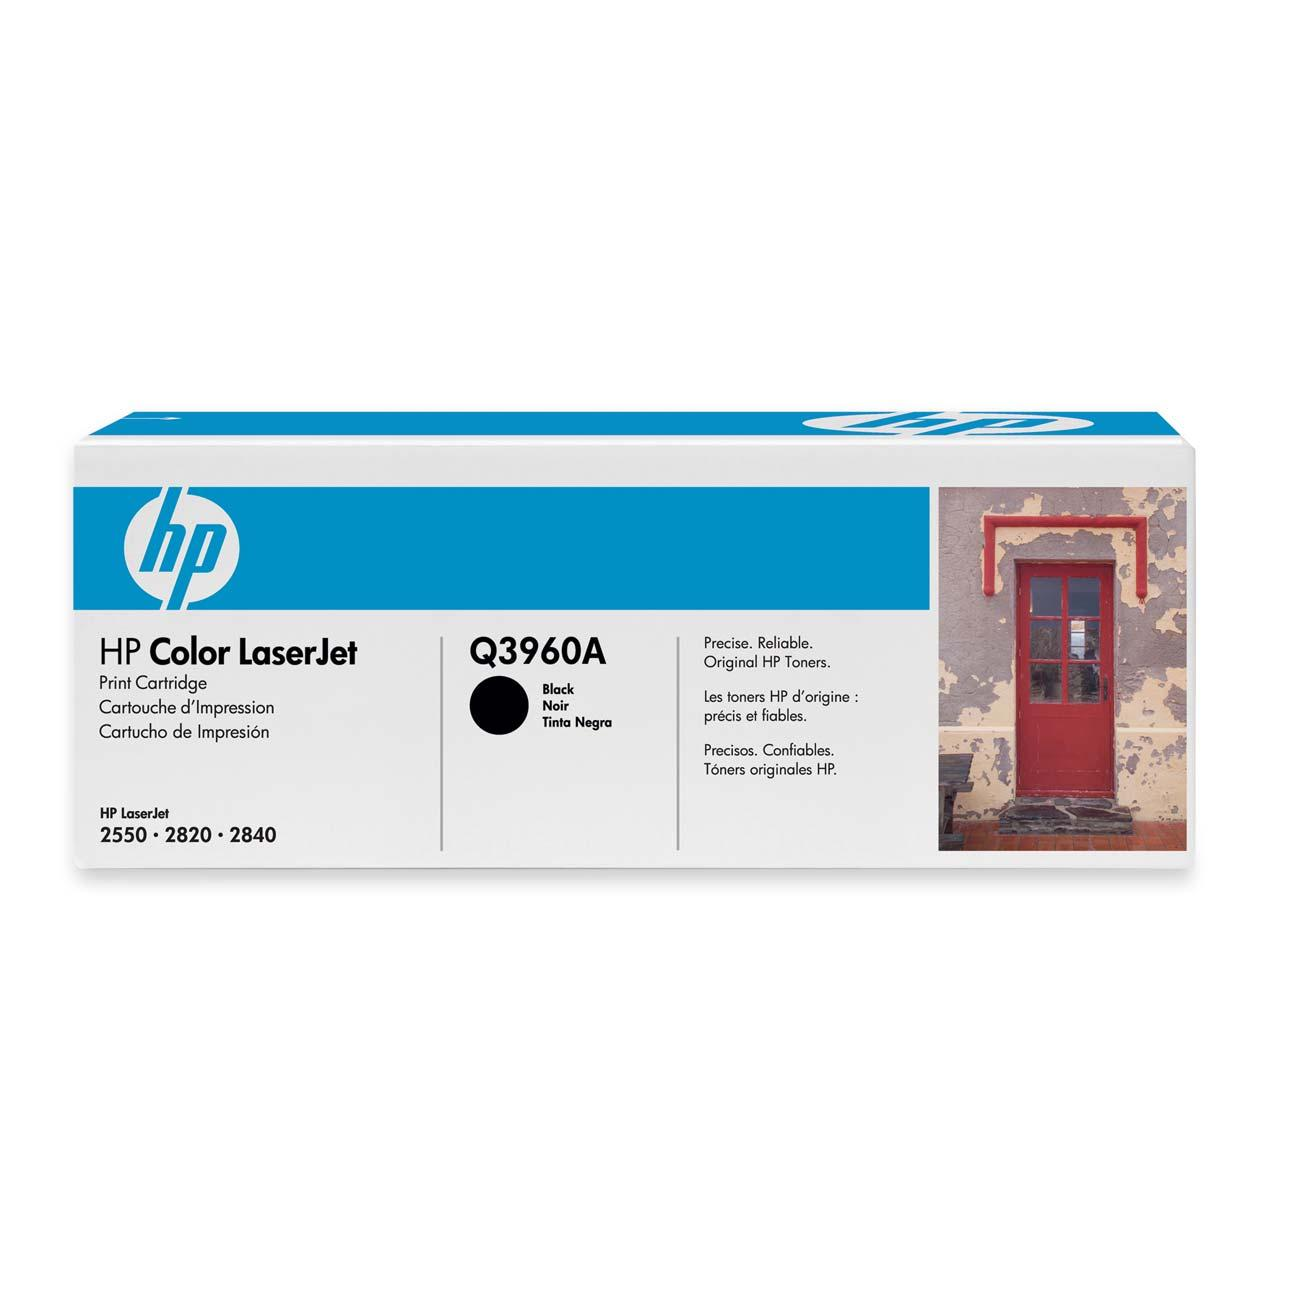 Hp Black Toner Cartridge Q3960a Hewq3960a 43x High Yield Original Laserjet C8543x